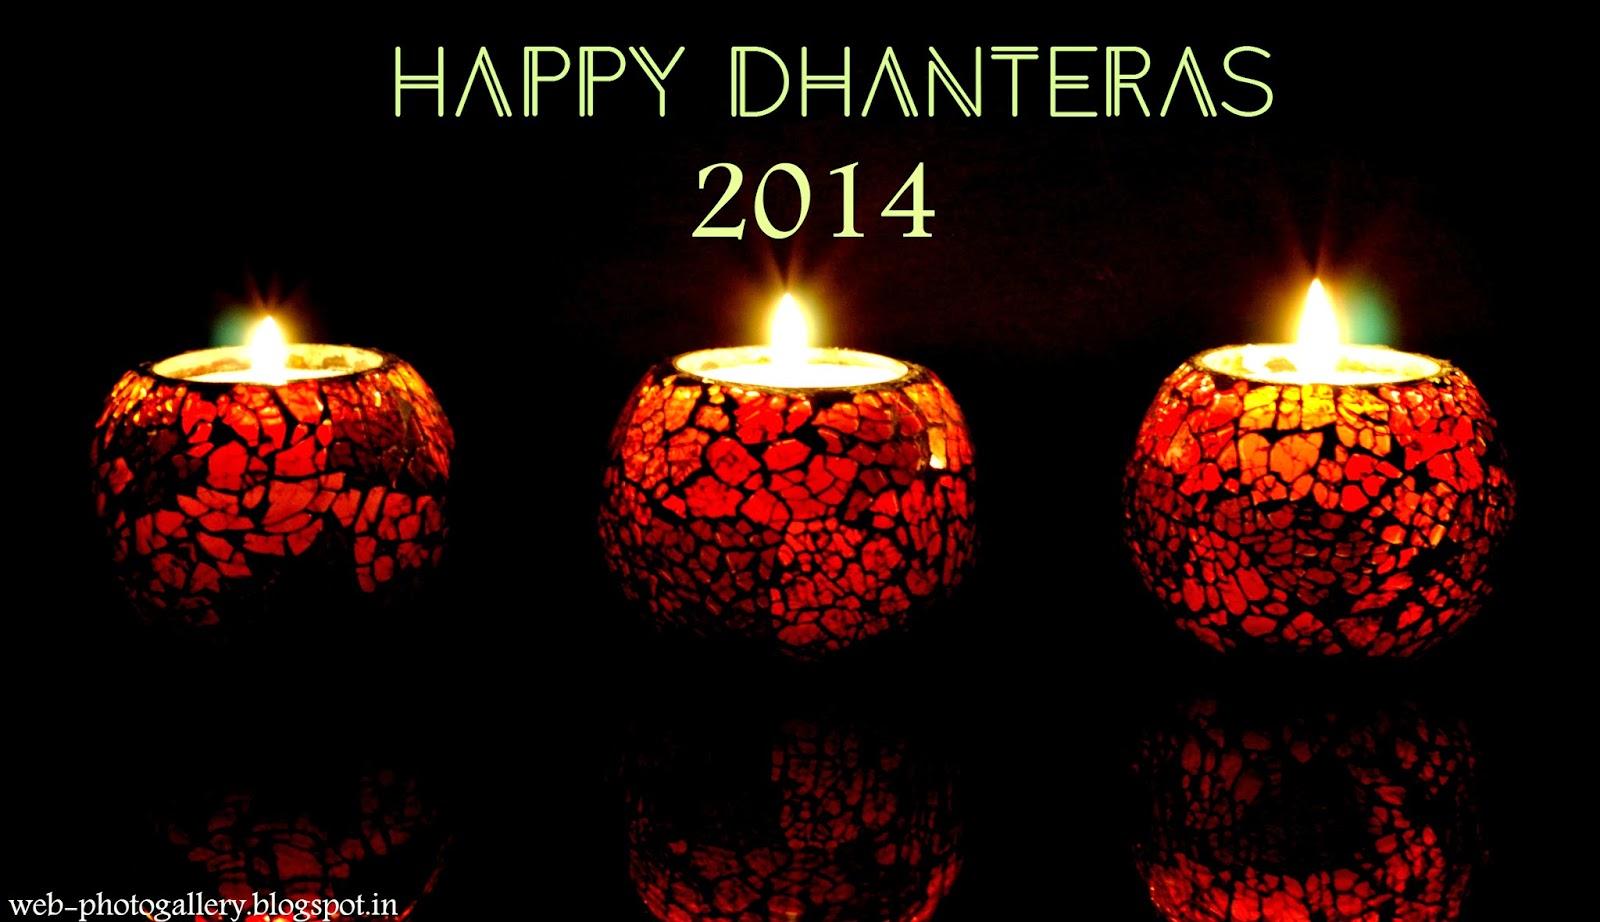 Happy Diwali And Dhanteras Wallpapers: Happy Dhanteras 2014 HD Wallpapers